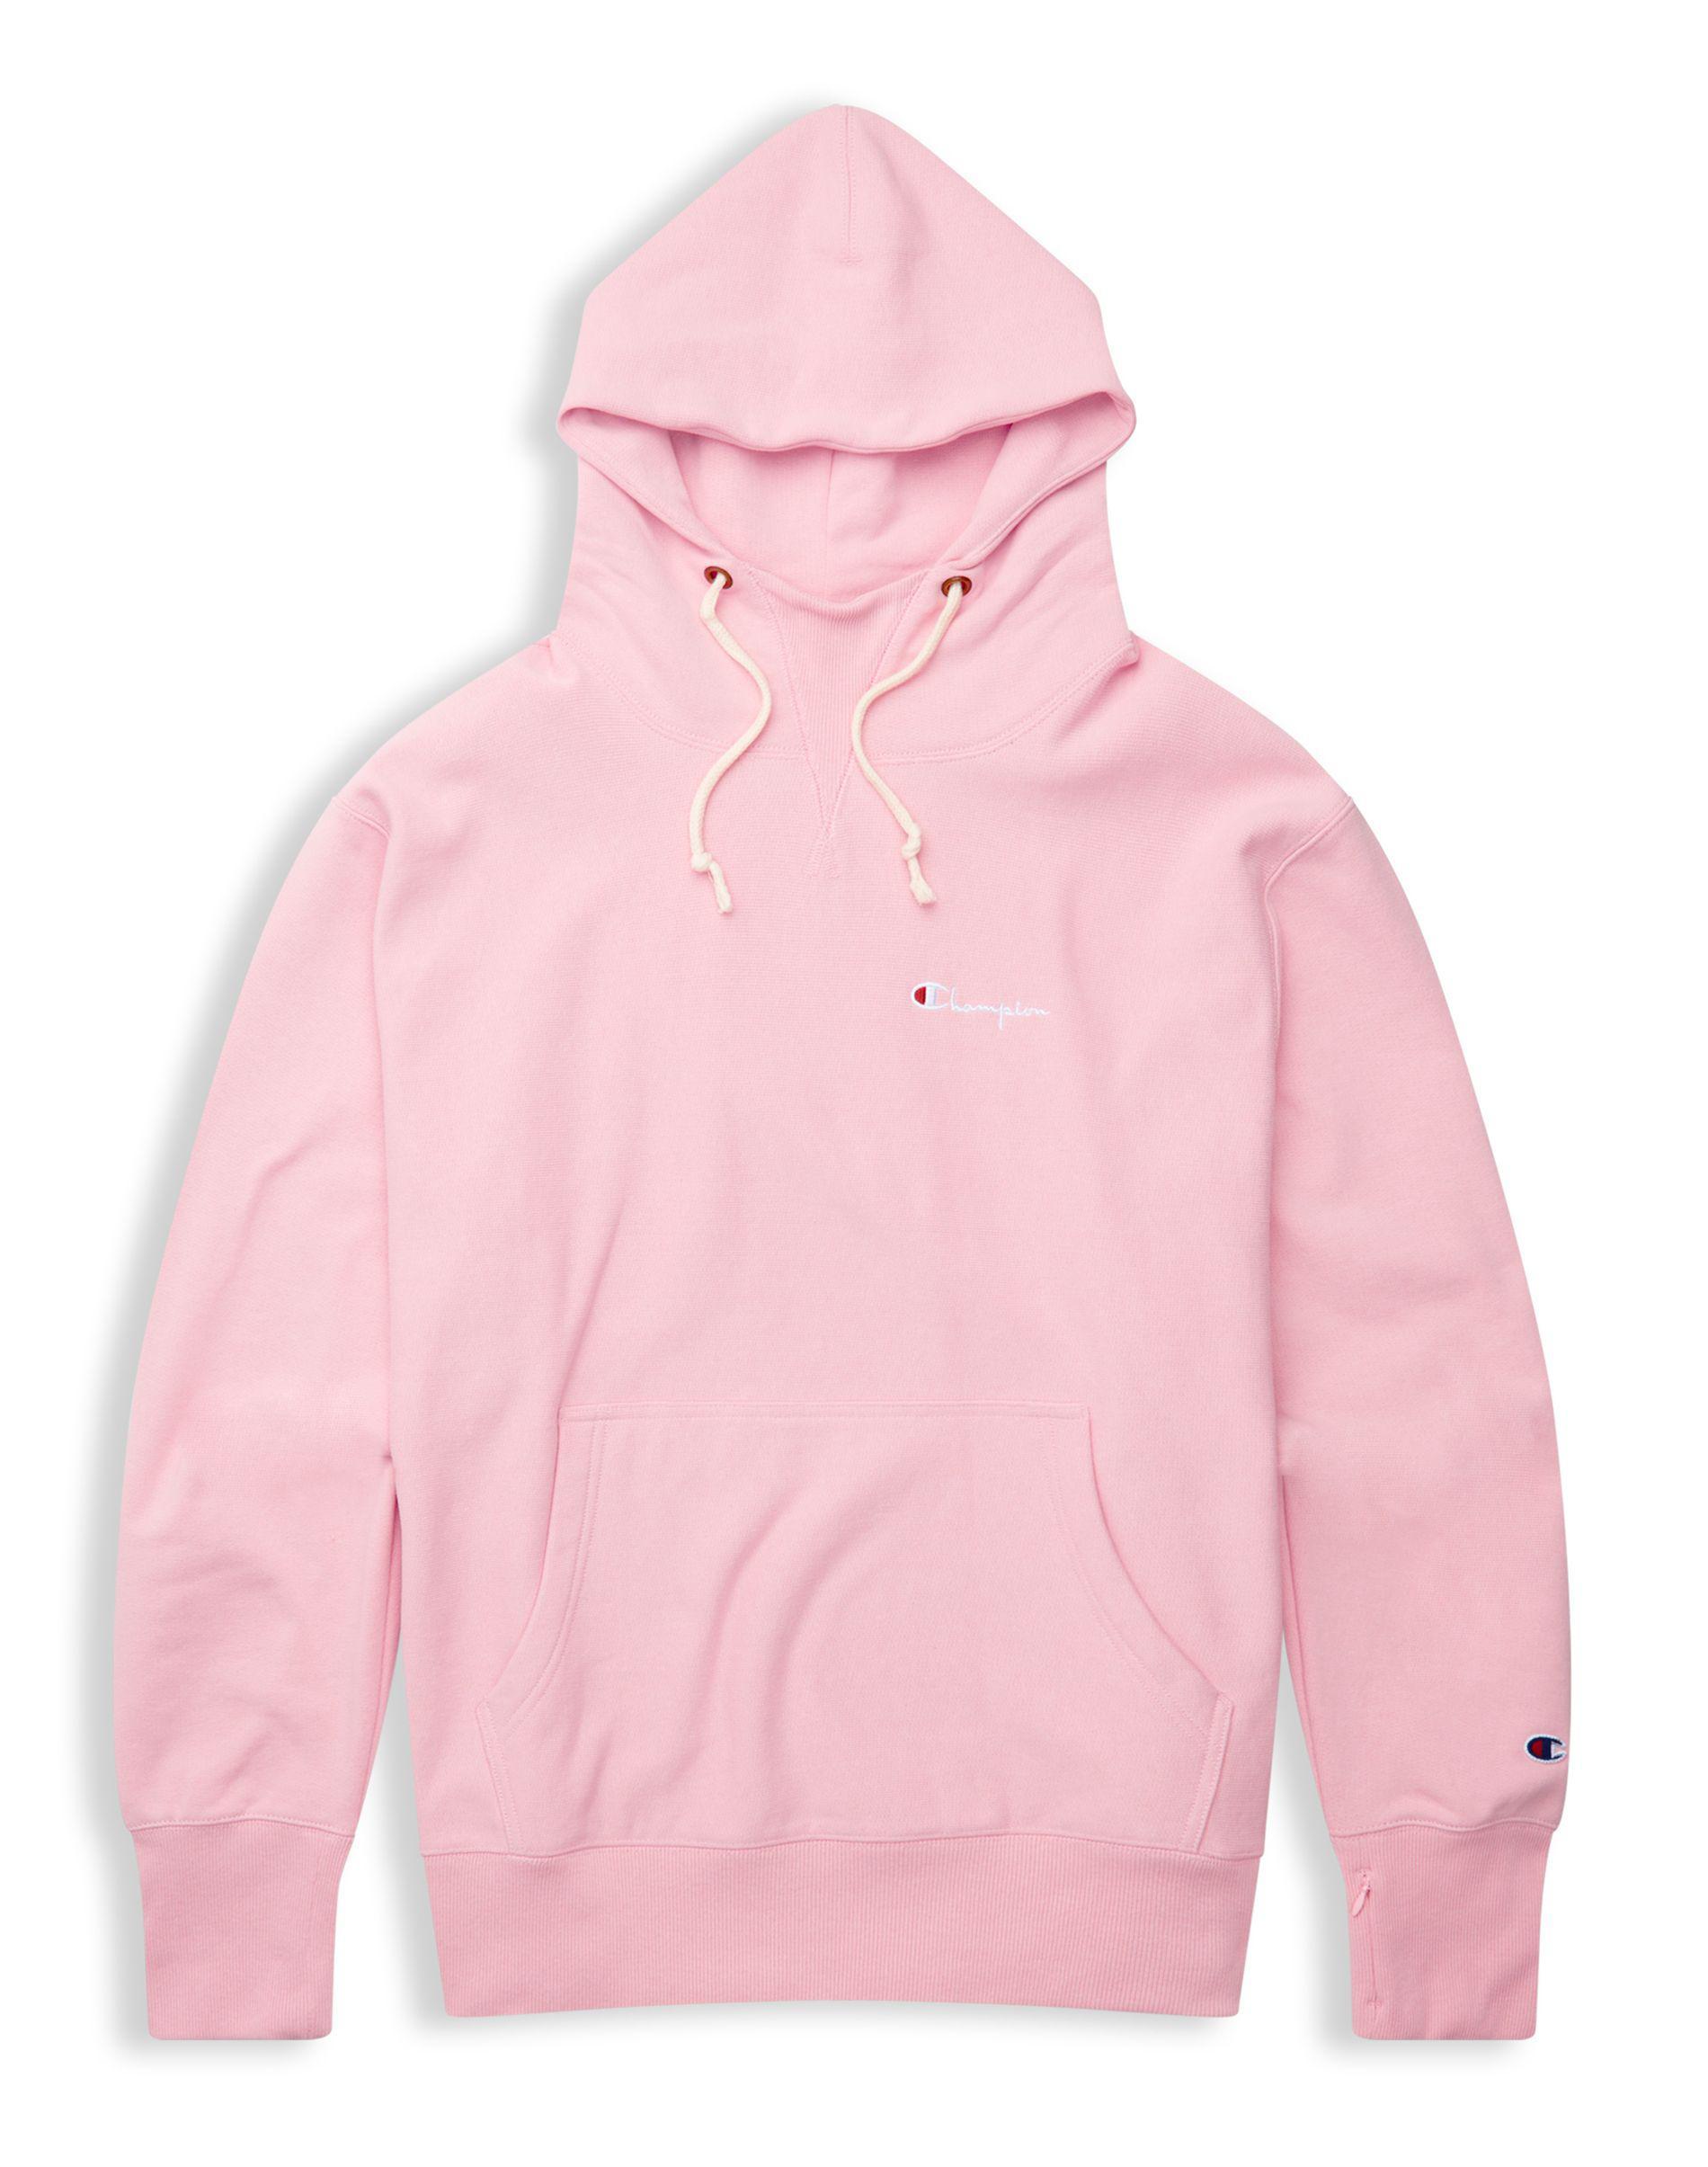 e5f95c488f4 Champion Premium Reverse Weave Hoodie Sweatshirts – EDGE Engineering ...